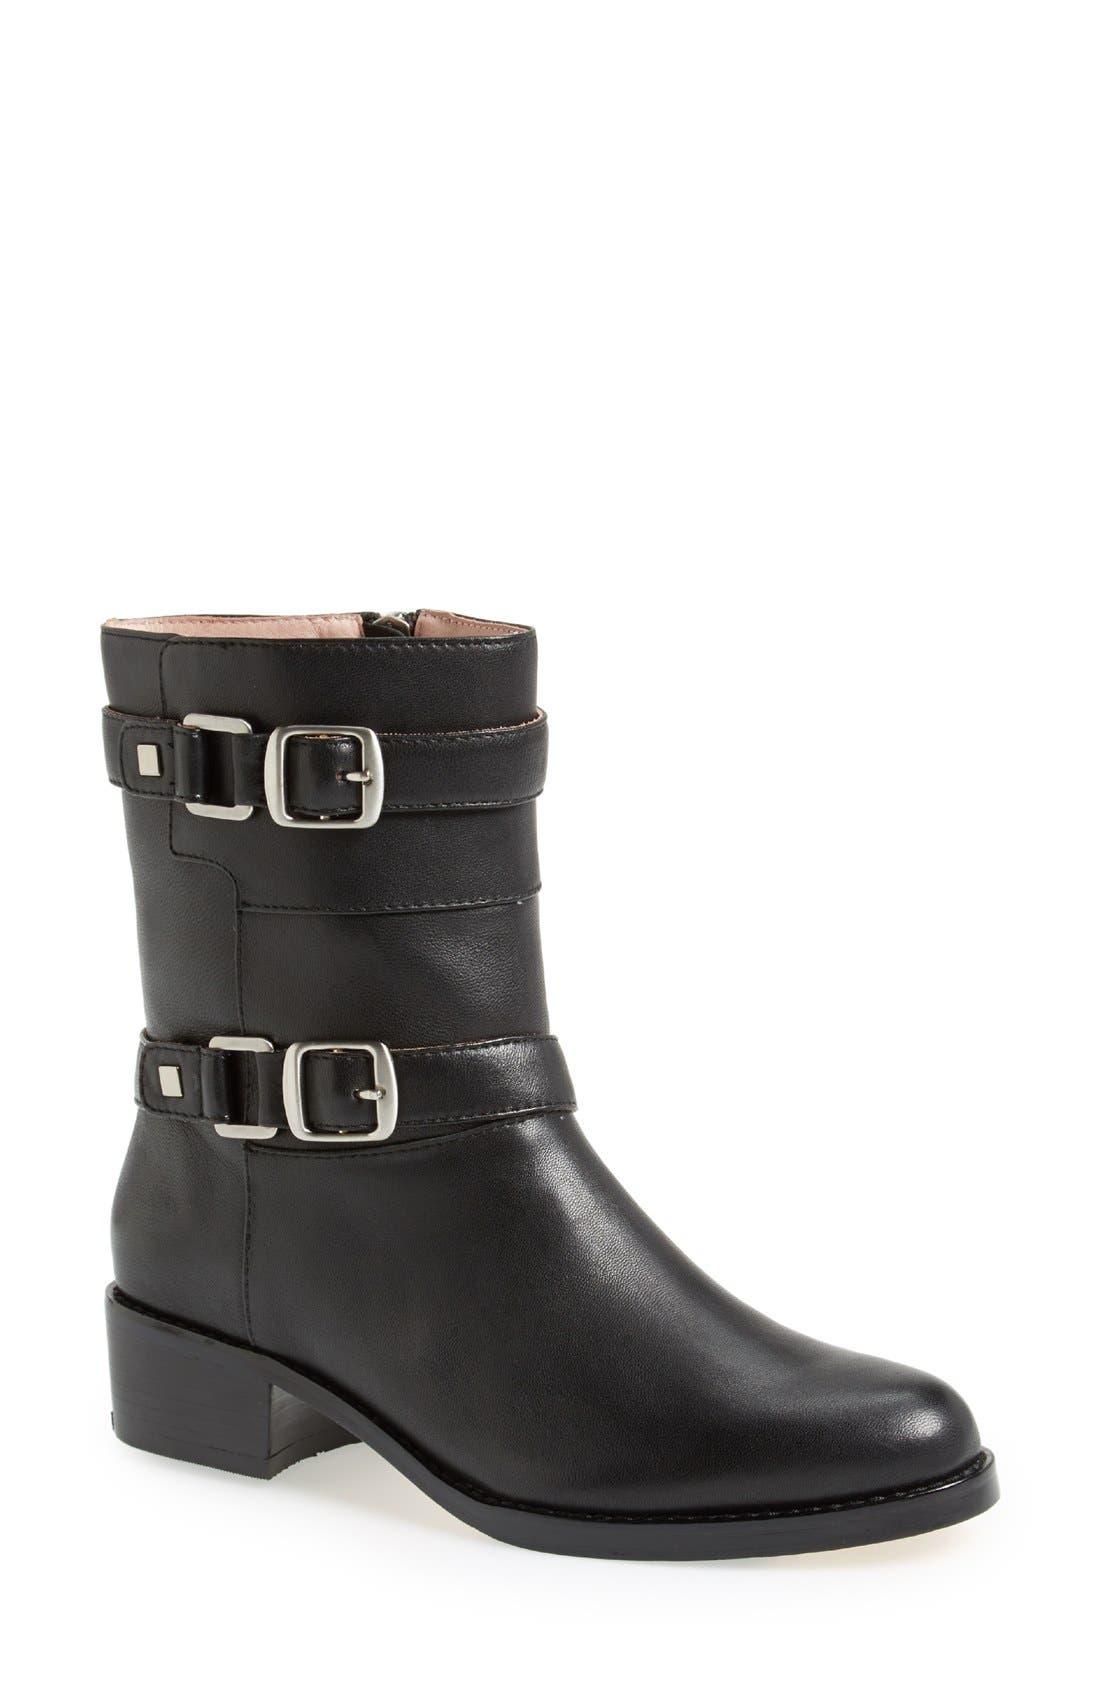 Main Image - Taryn Rose 'Sammie' Leather Moto Boot (Women)